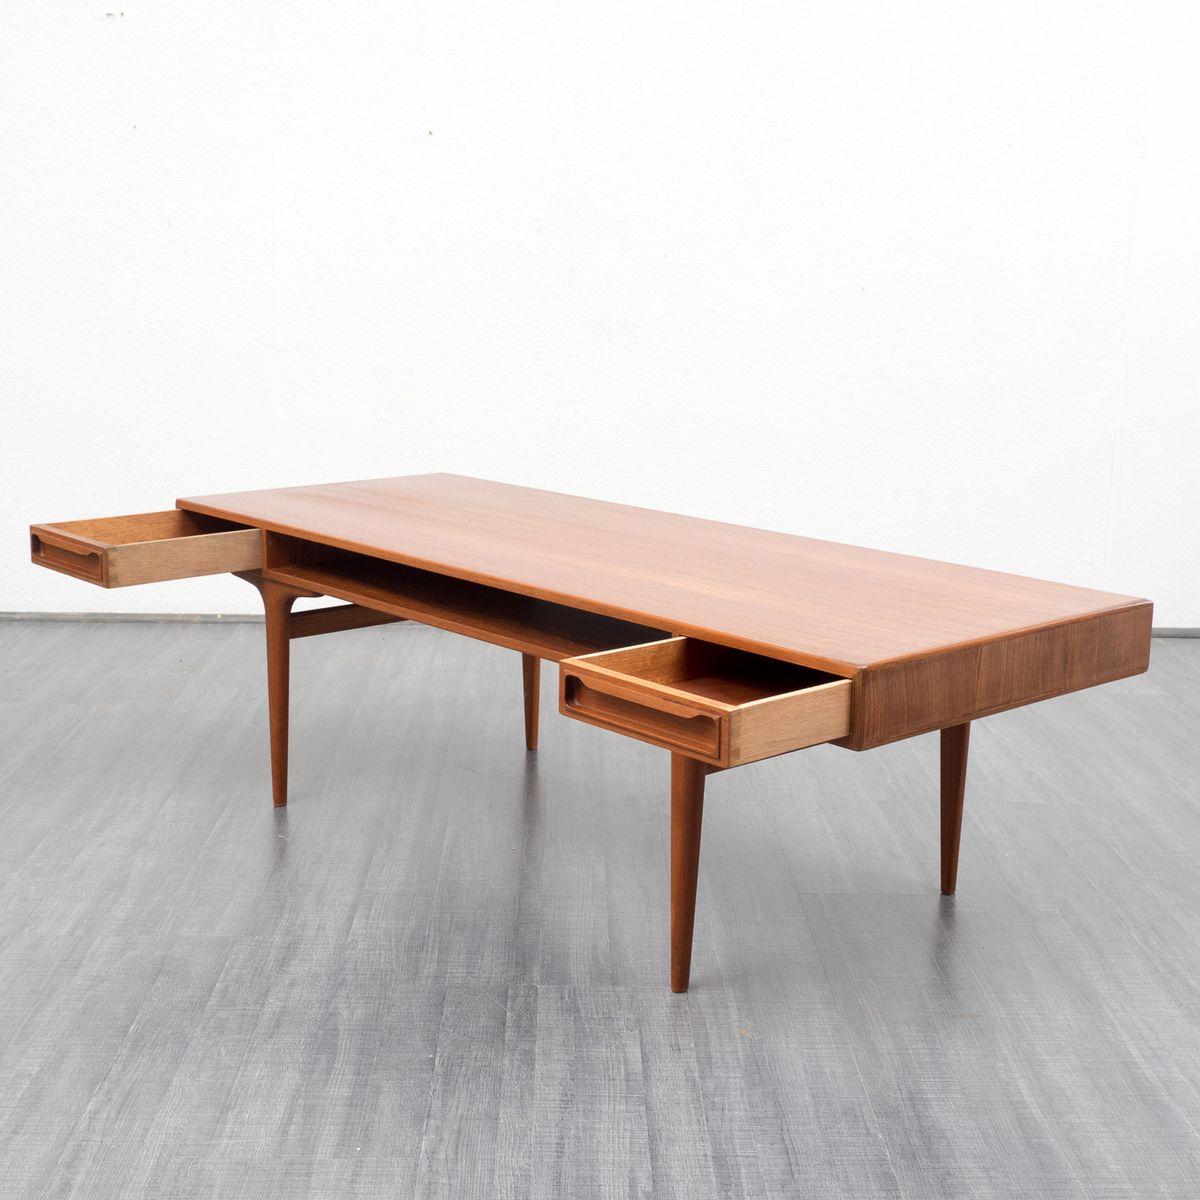 Coffee Table With Drawers Sale: Vintage Teak Coffee Table With Two Drawers For Sale At Pamono